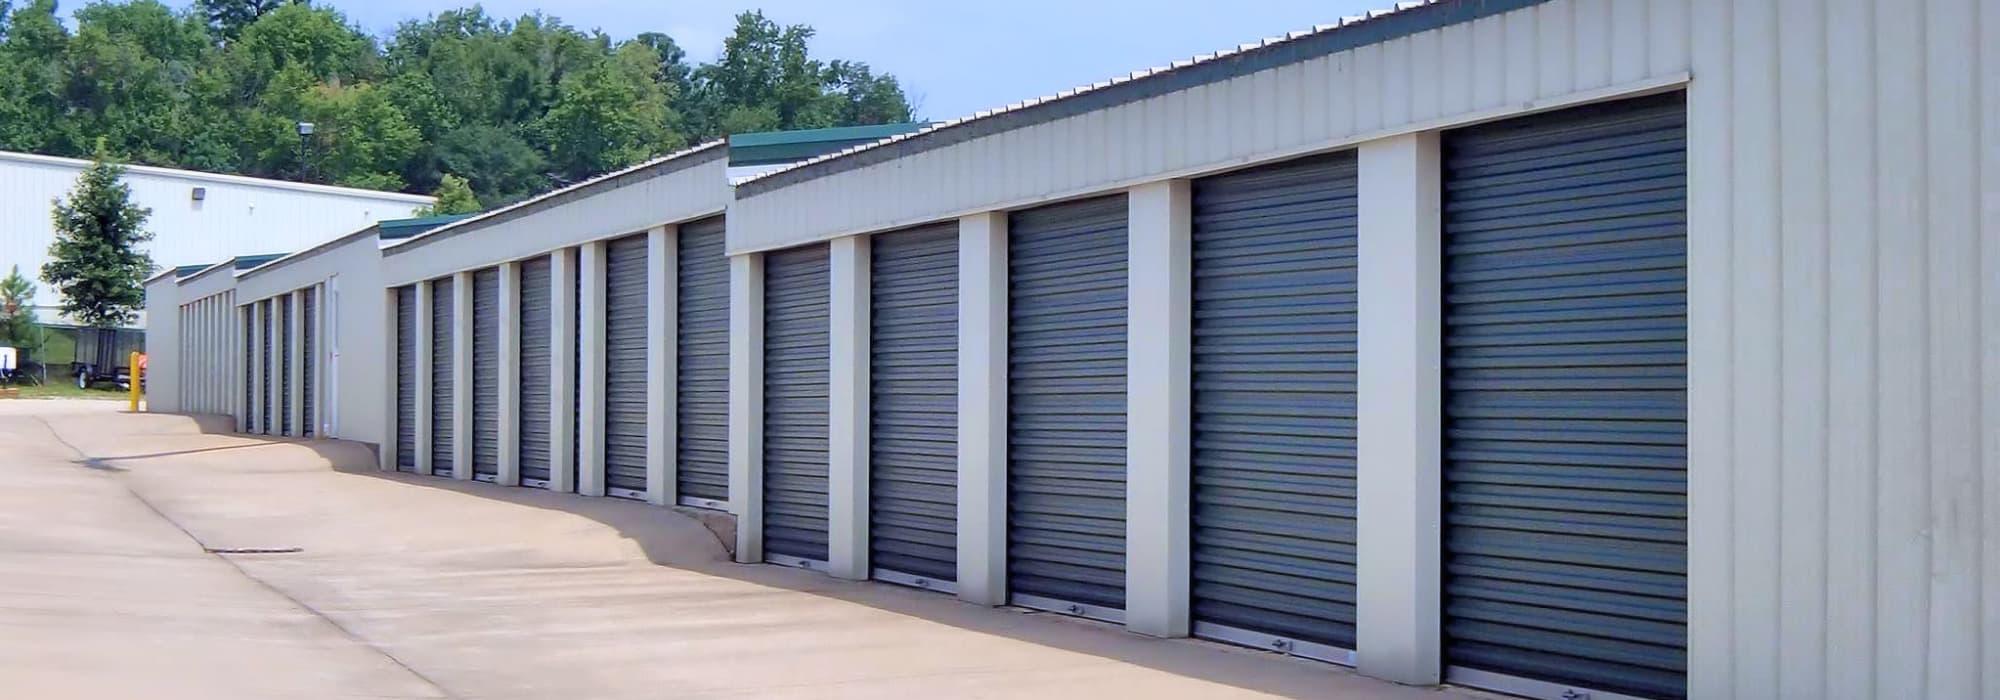 An Extra Room Self Storage in Midland, GA